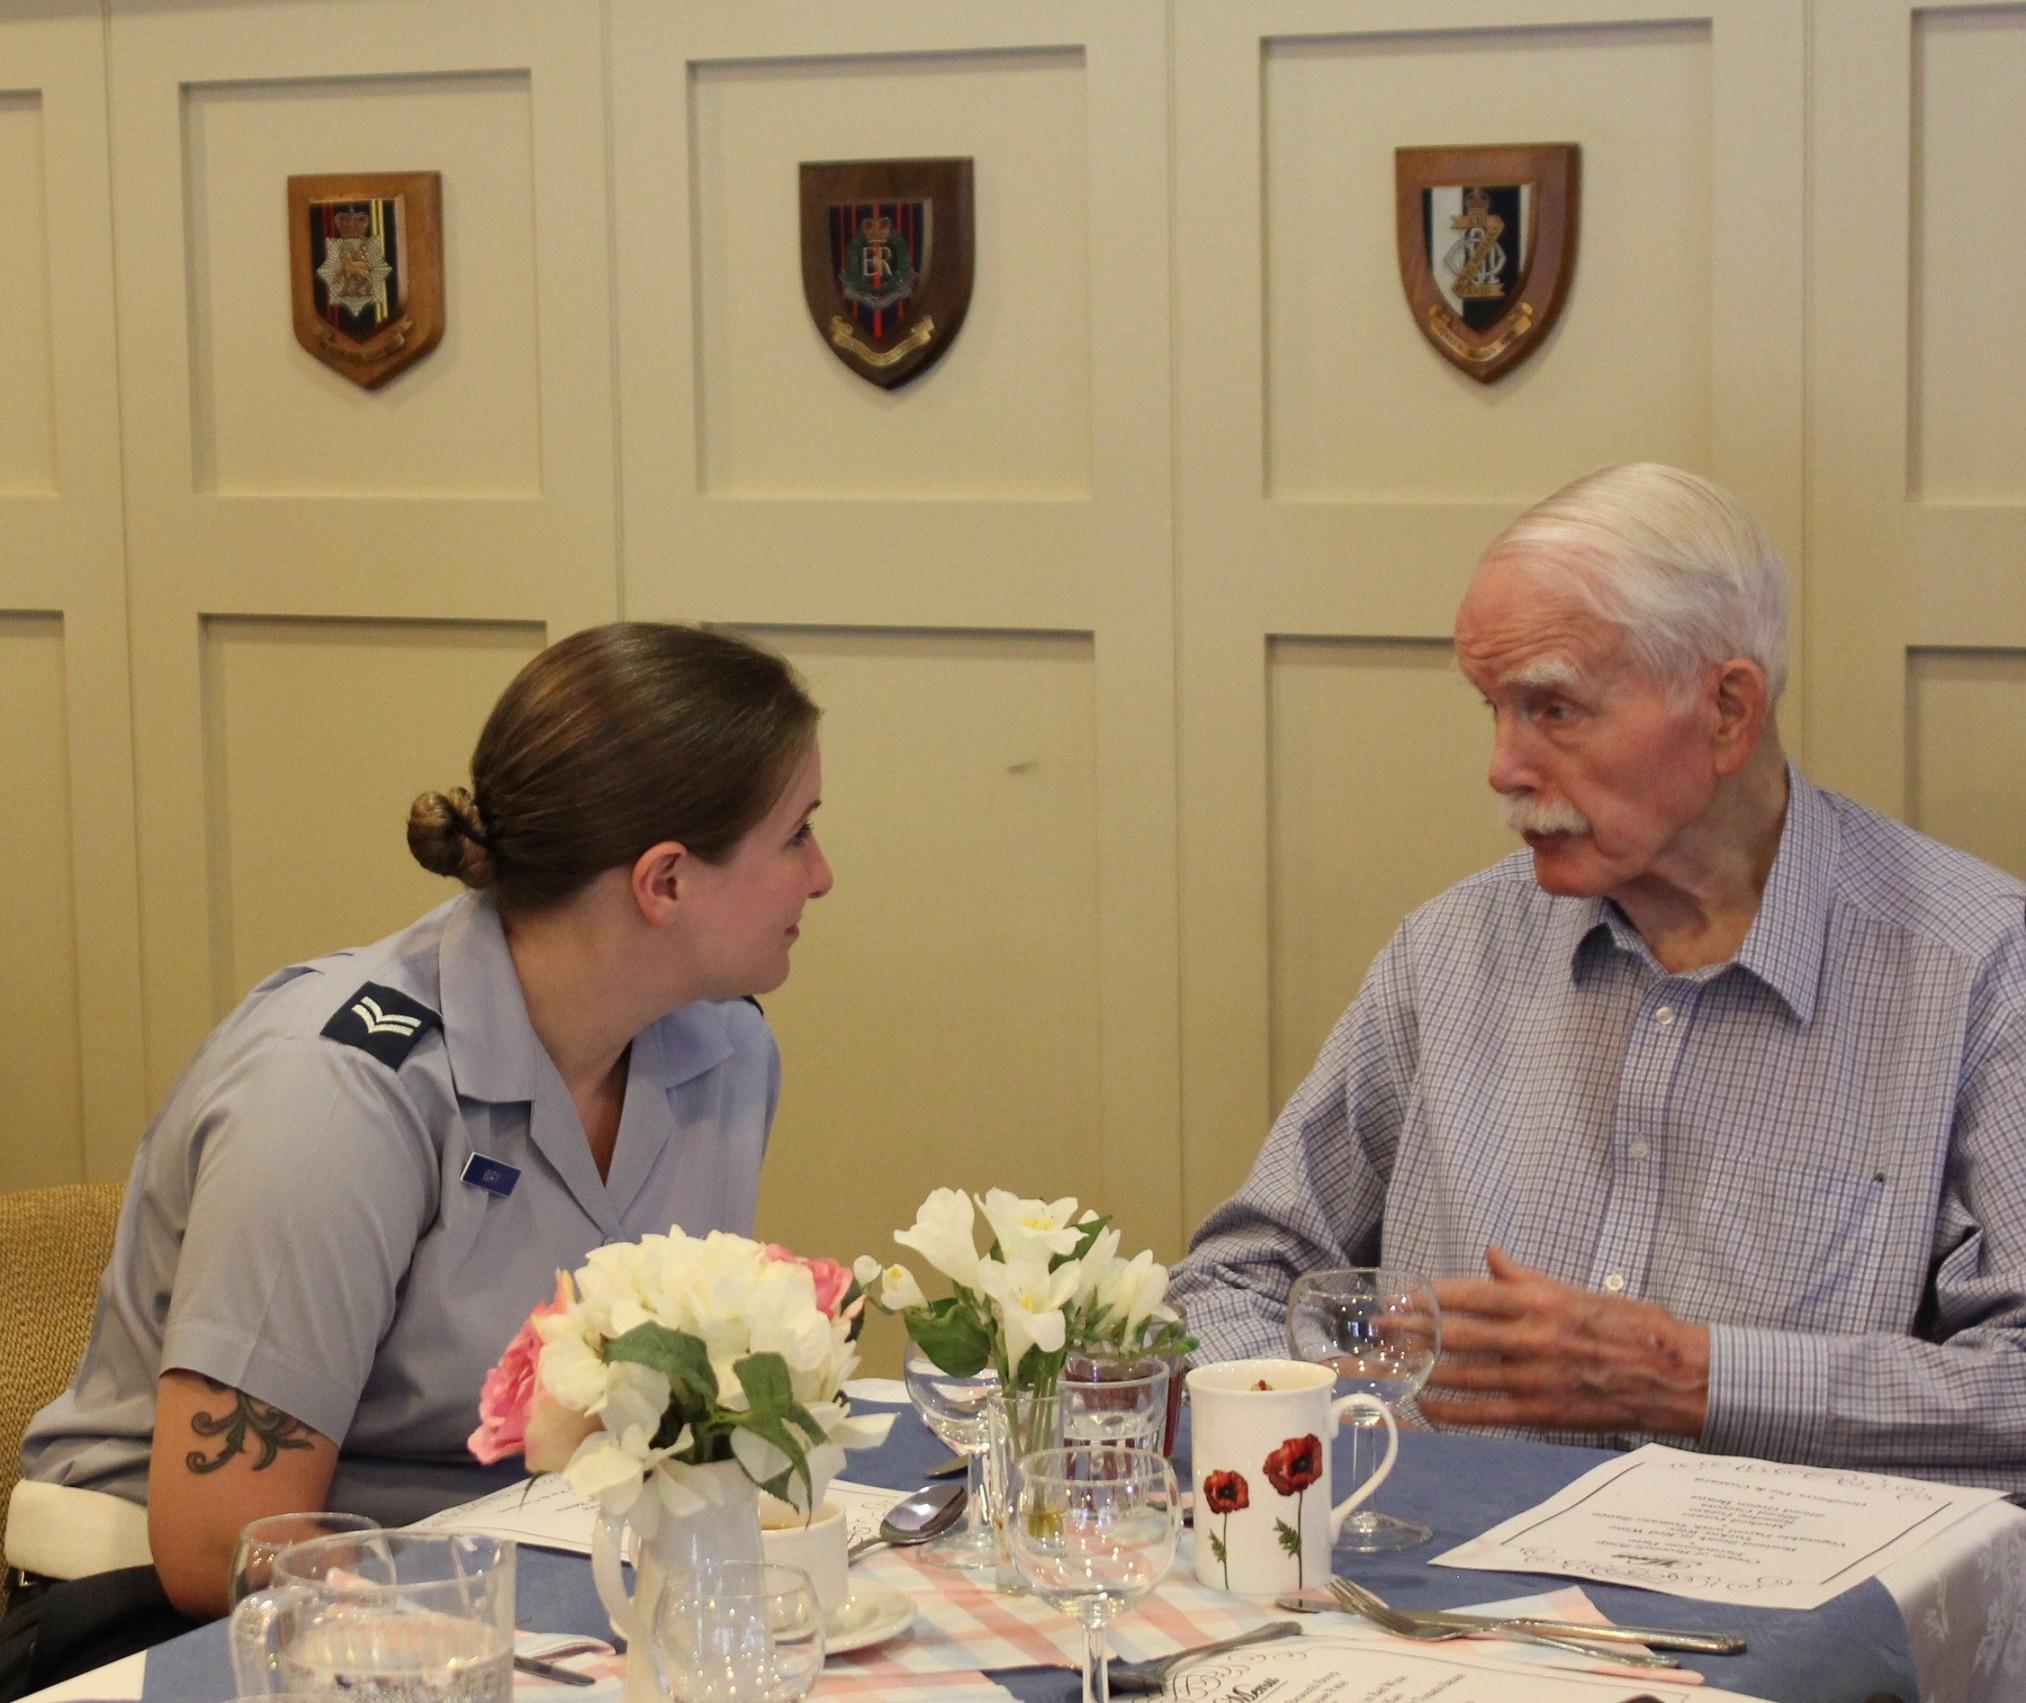 raf halton visits disabled veterans living at the royal star garter